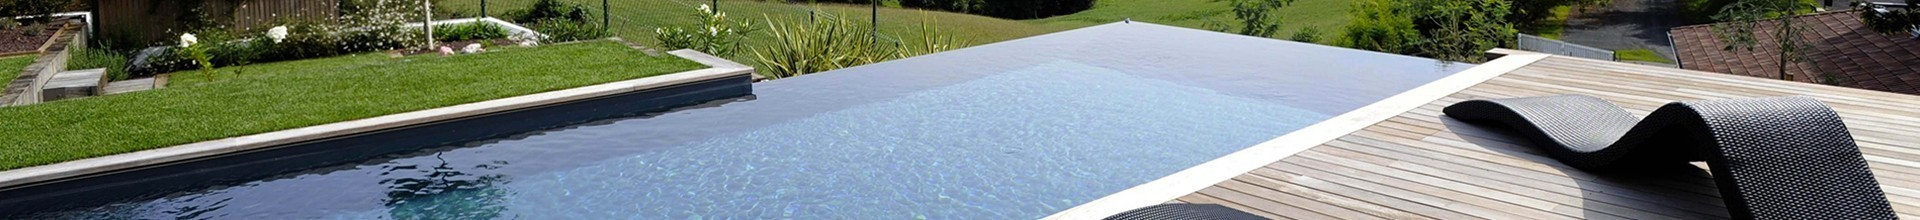 Projet piscine Pays : Allemagne : votre projet coque polyester